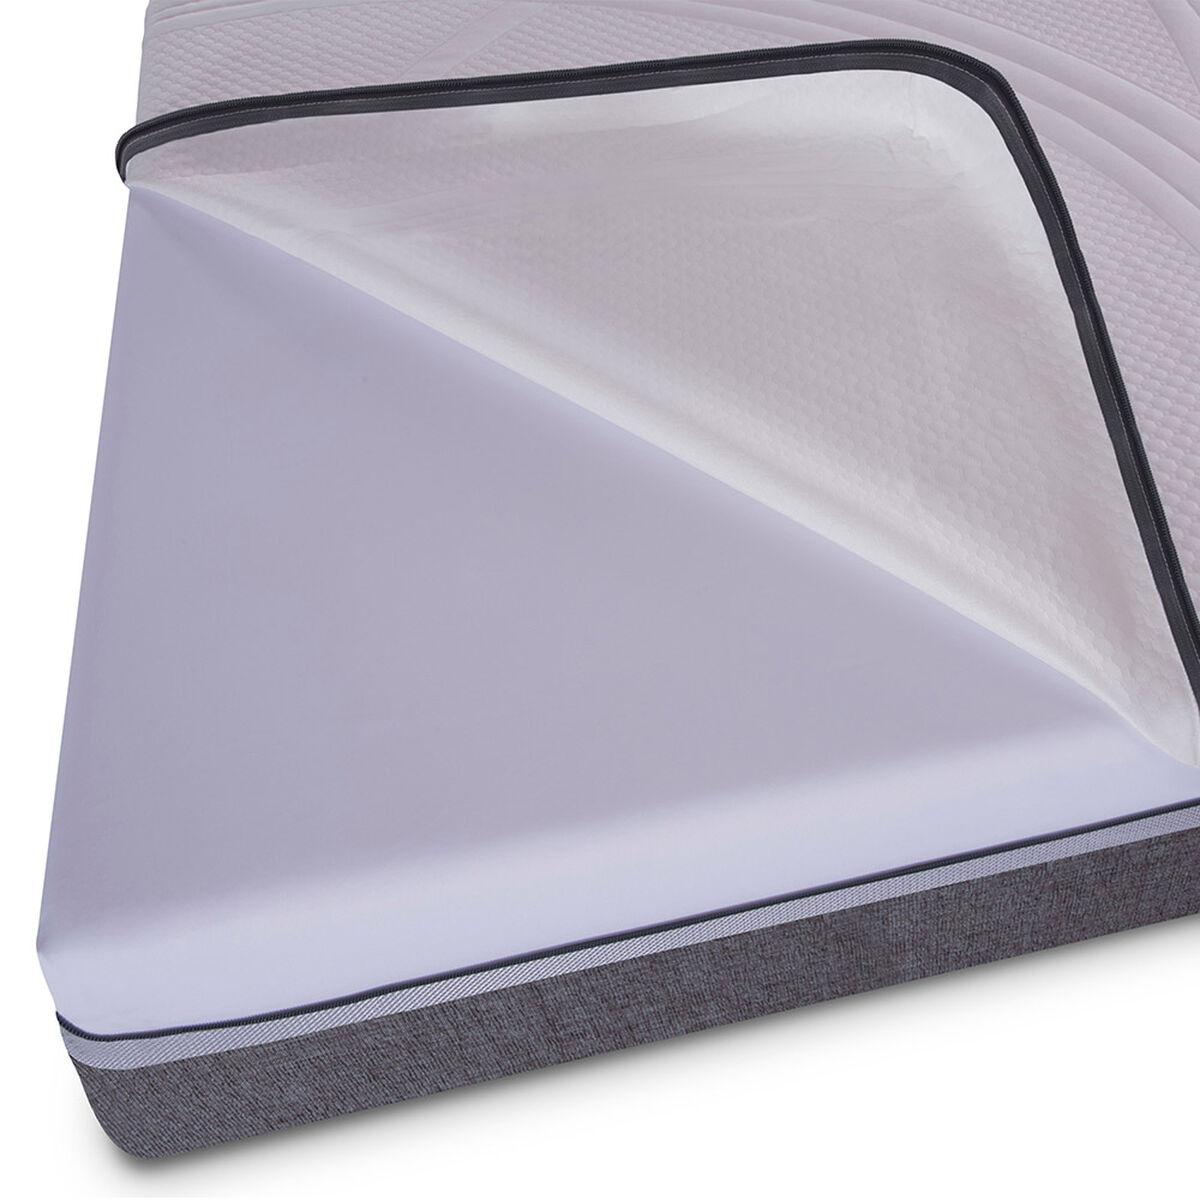 Box Spring 2 Plazas Ortopedic Advance + Textil